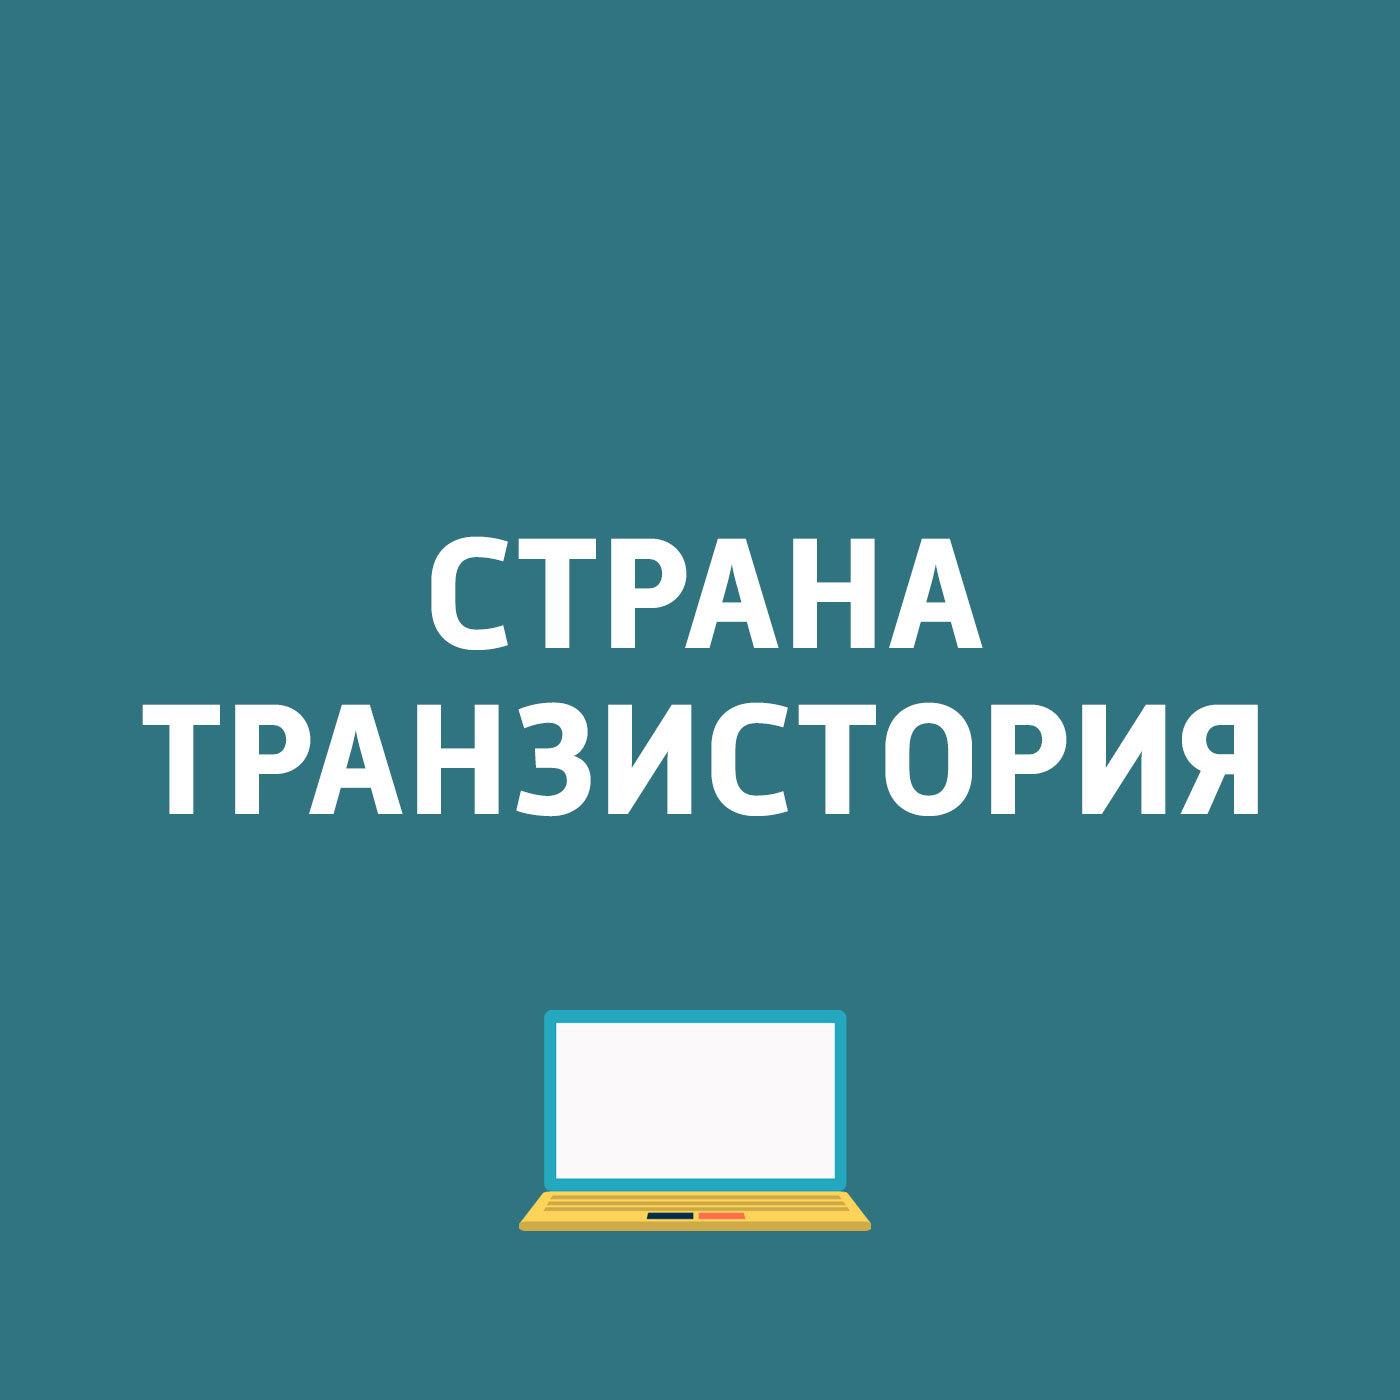 Картаев Павел One Plus 5; новая функция Instagram; Angry Birds Evolution... цена и фото